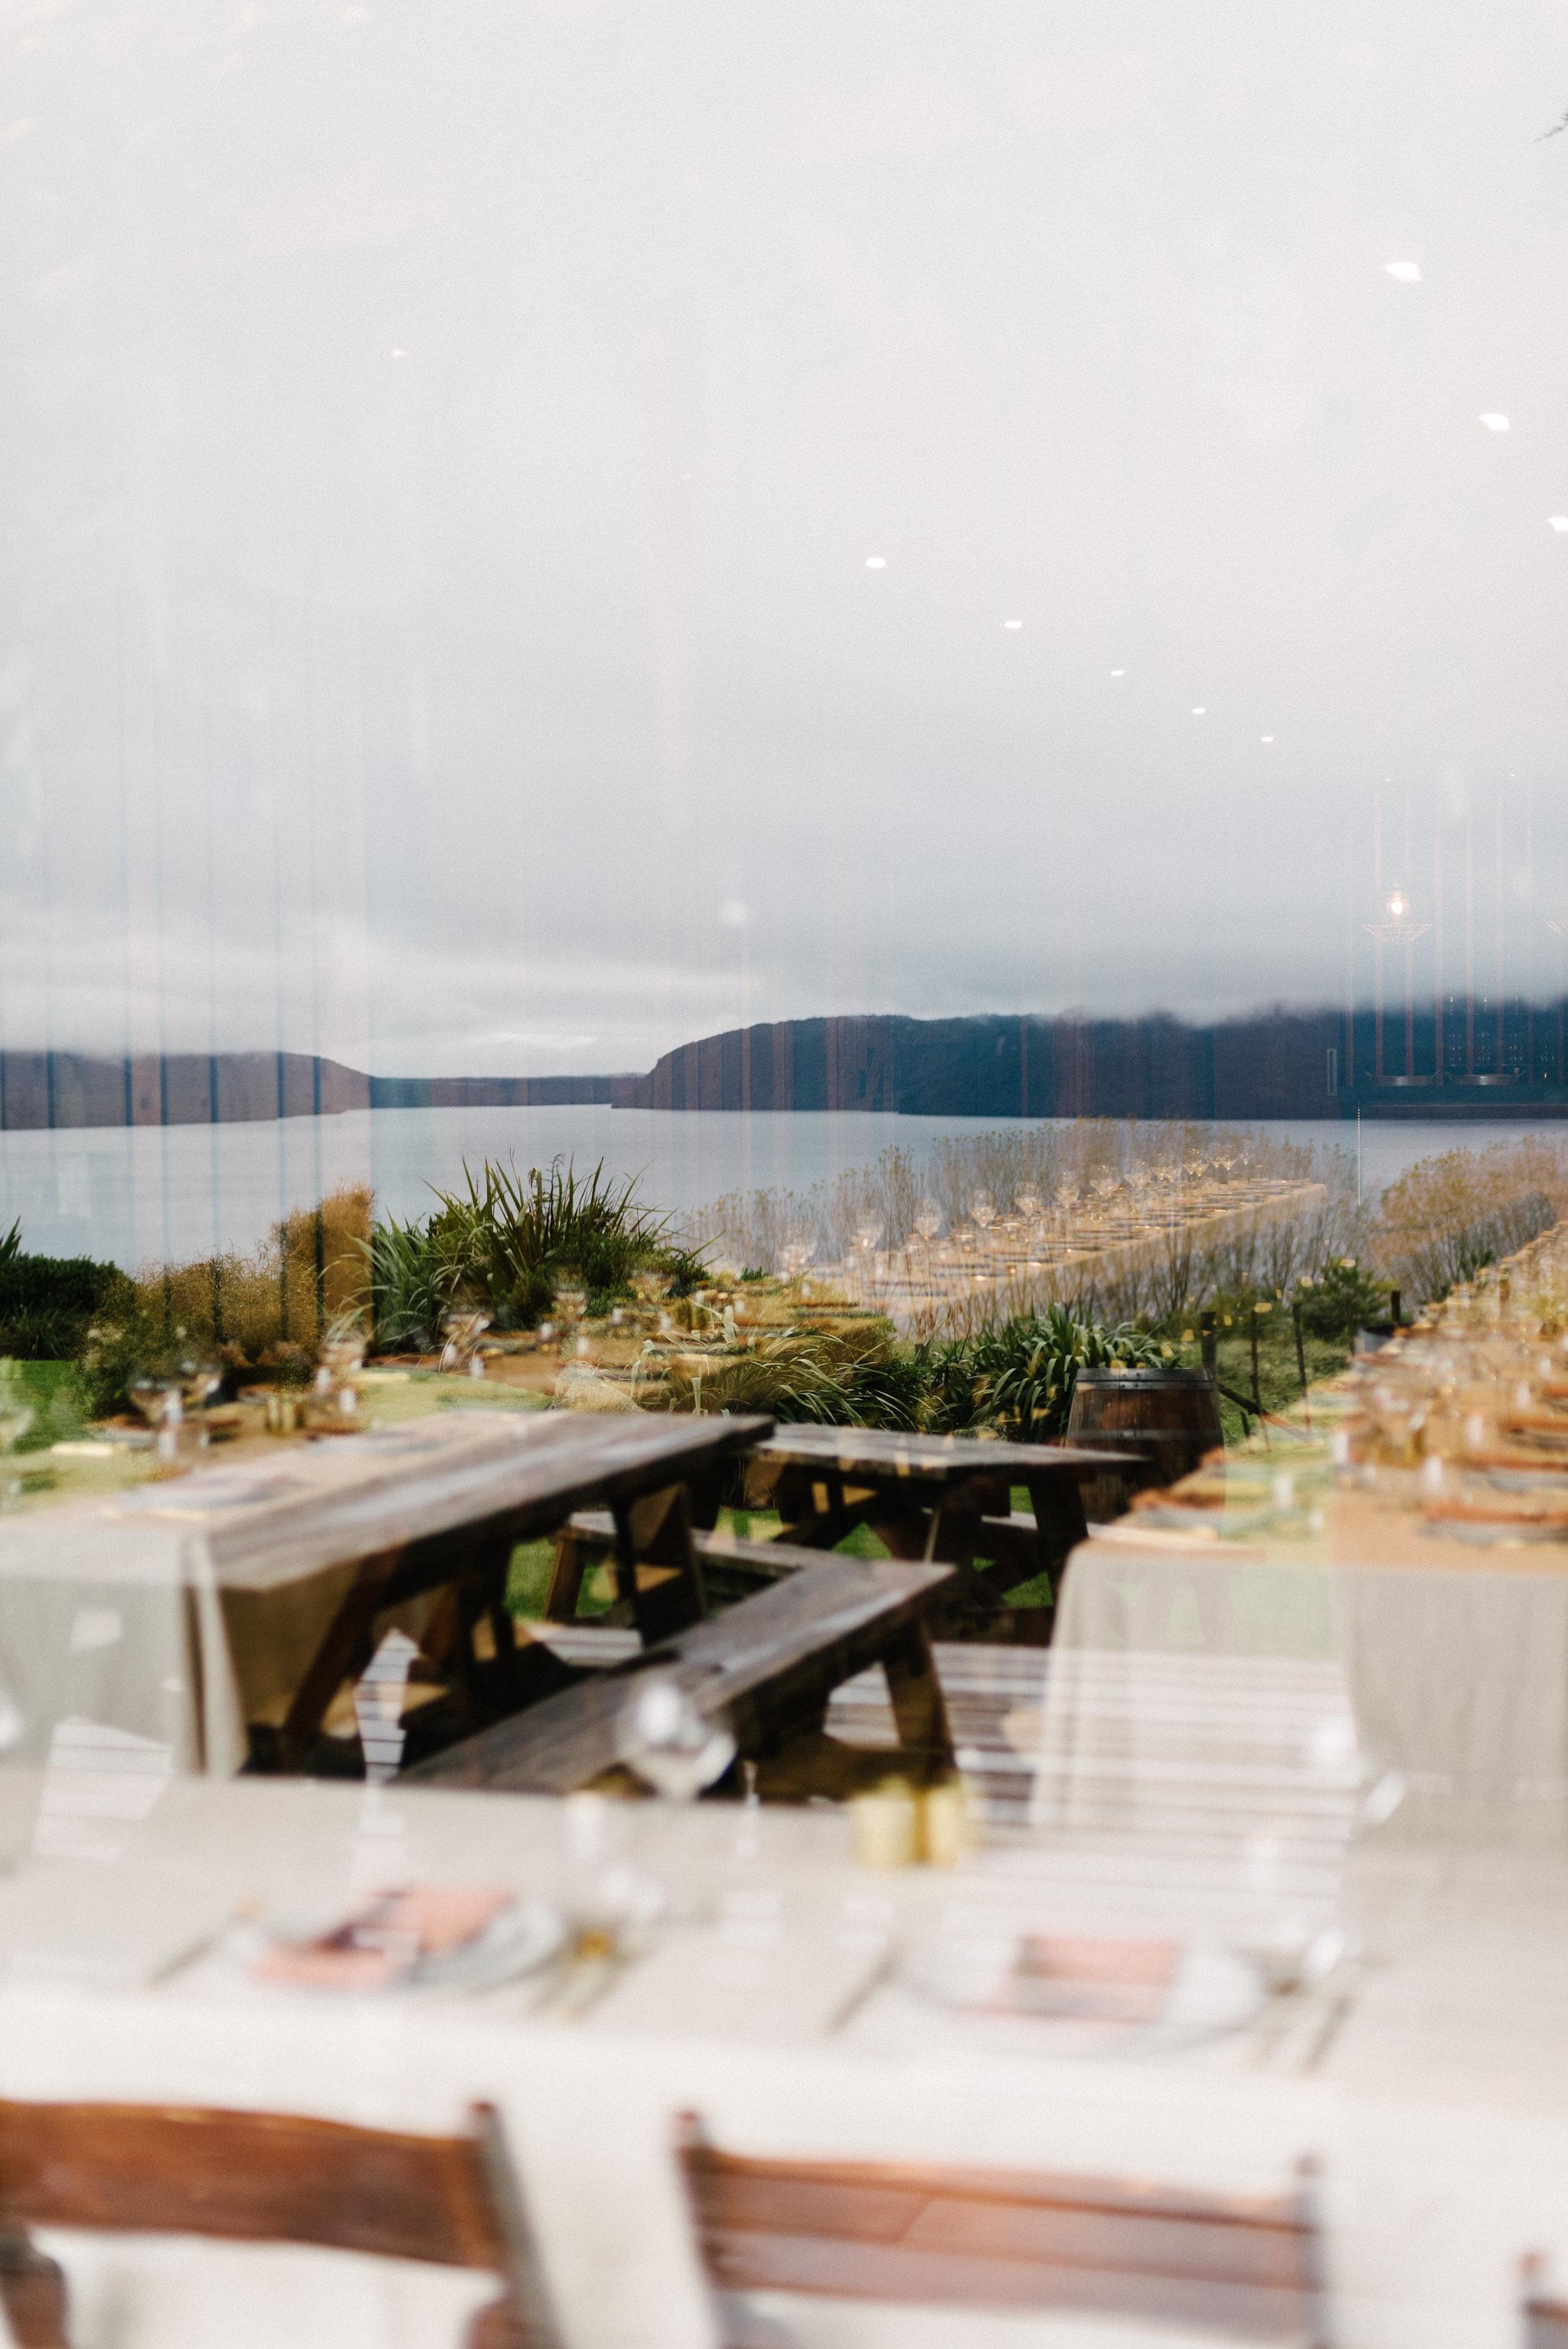 marionhphotography-Steph-Lance-Black_Barn_Tuawini-Rotorua-14April2018-WEB-696.jpg